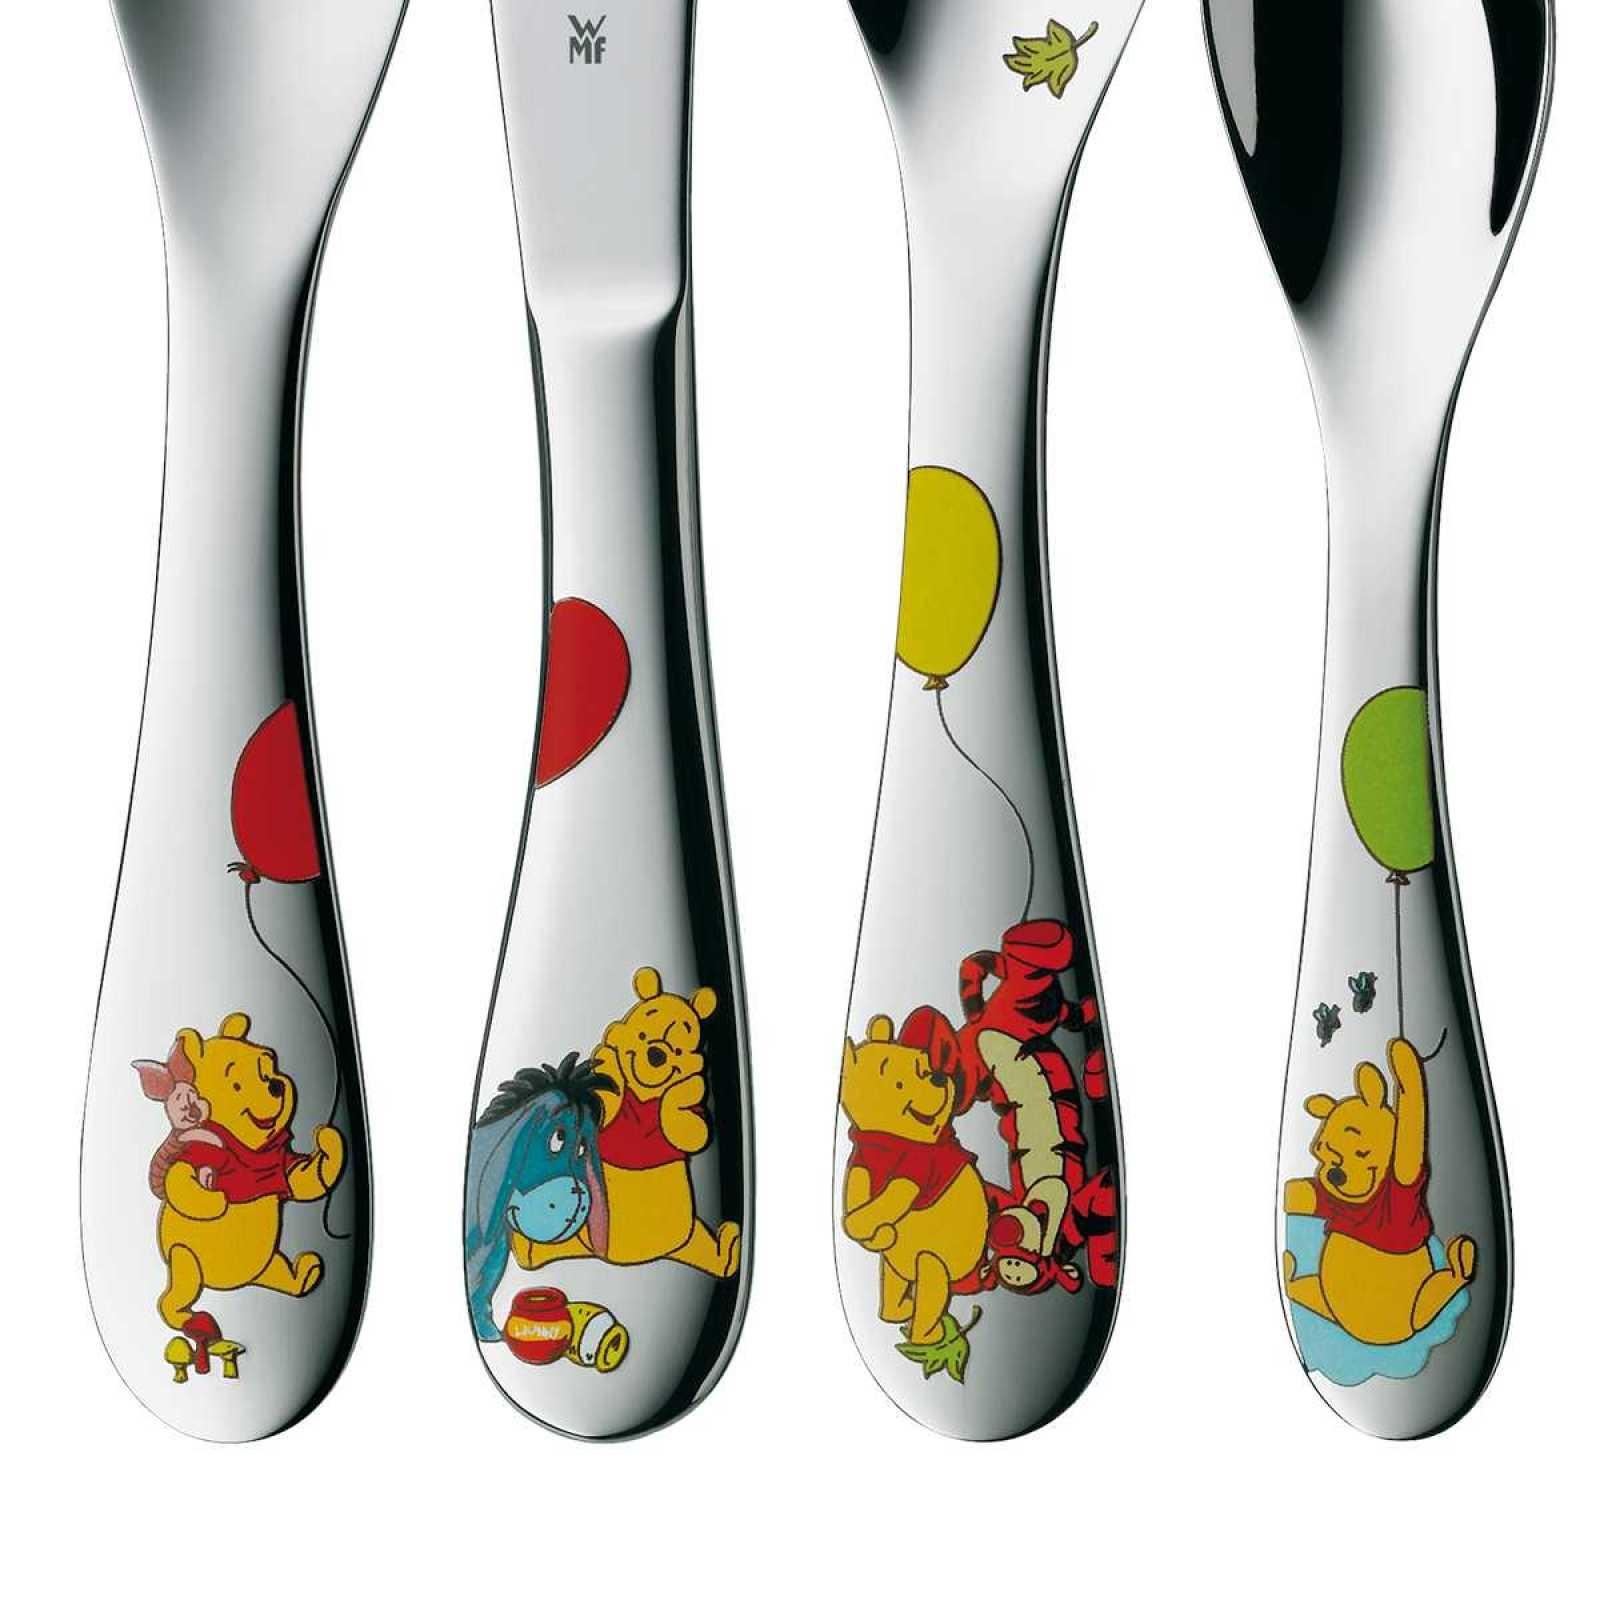 Набор приборов столовых 4 пр. детские WMF Winnie The Pooh  (12 8350 6040) WMF 12 8350 6040 фото 1